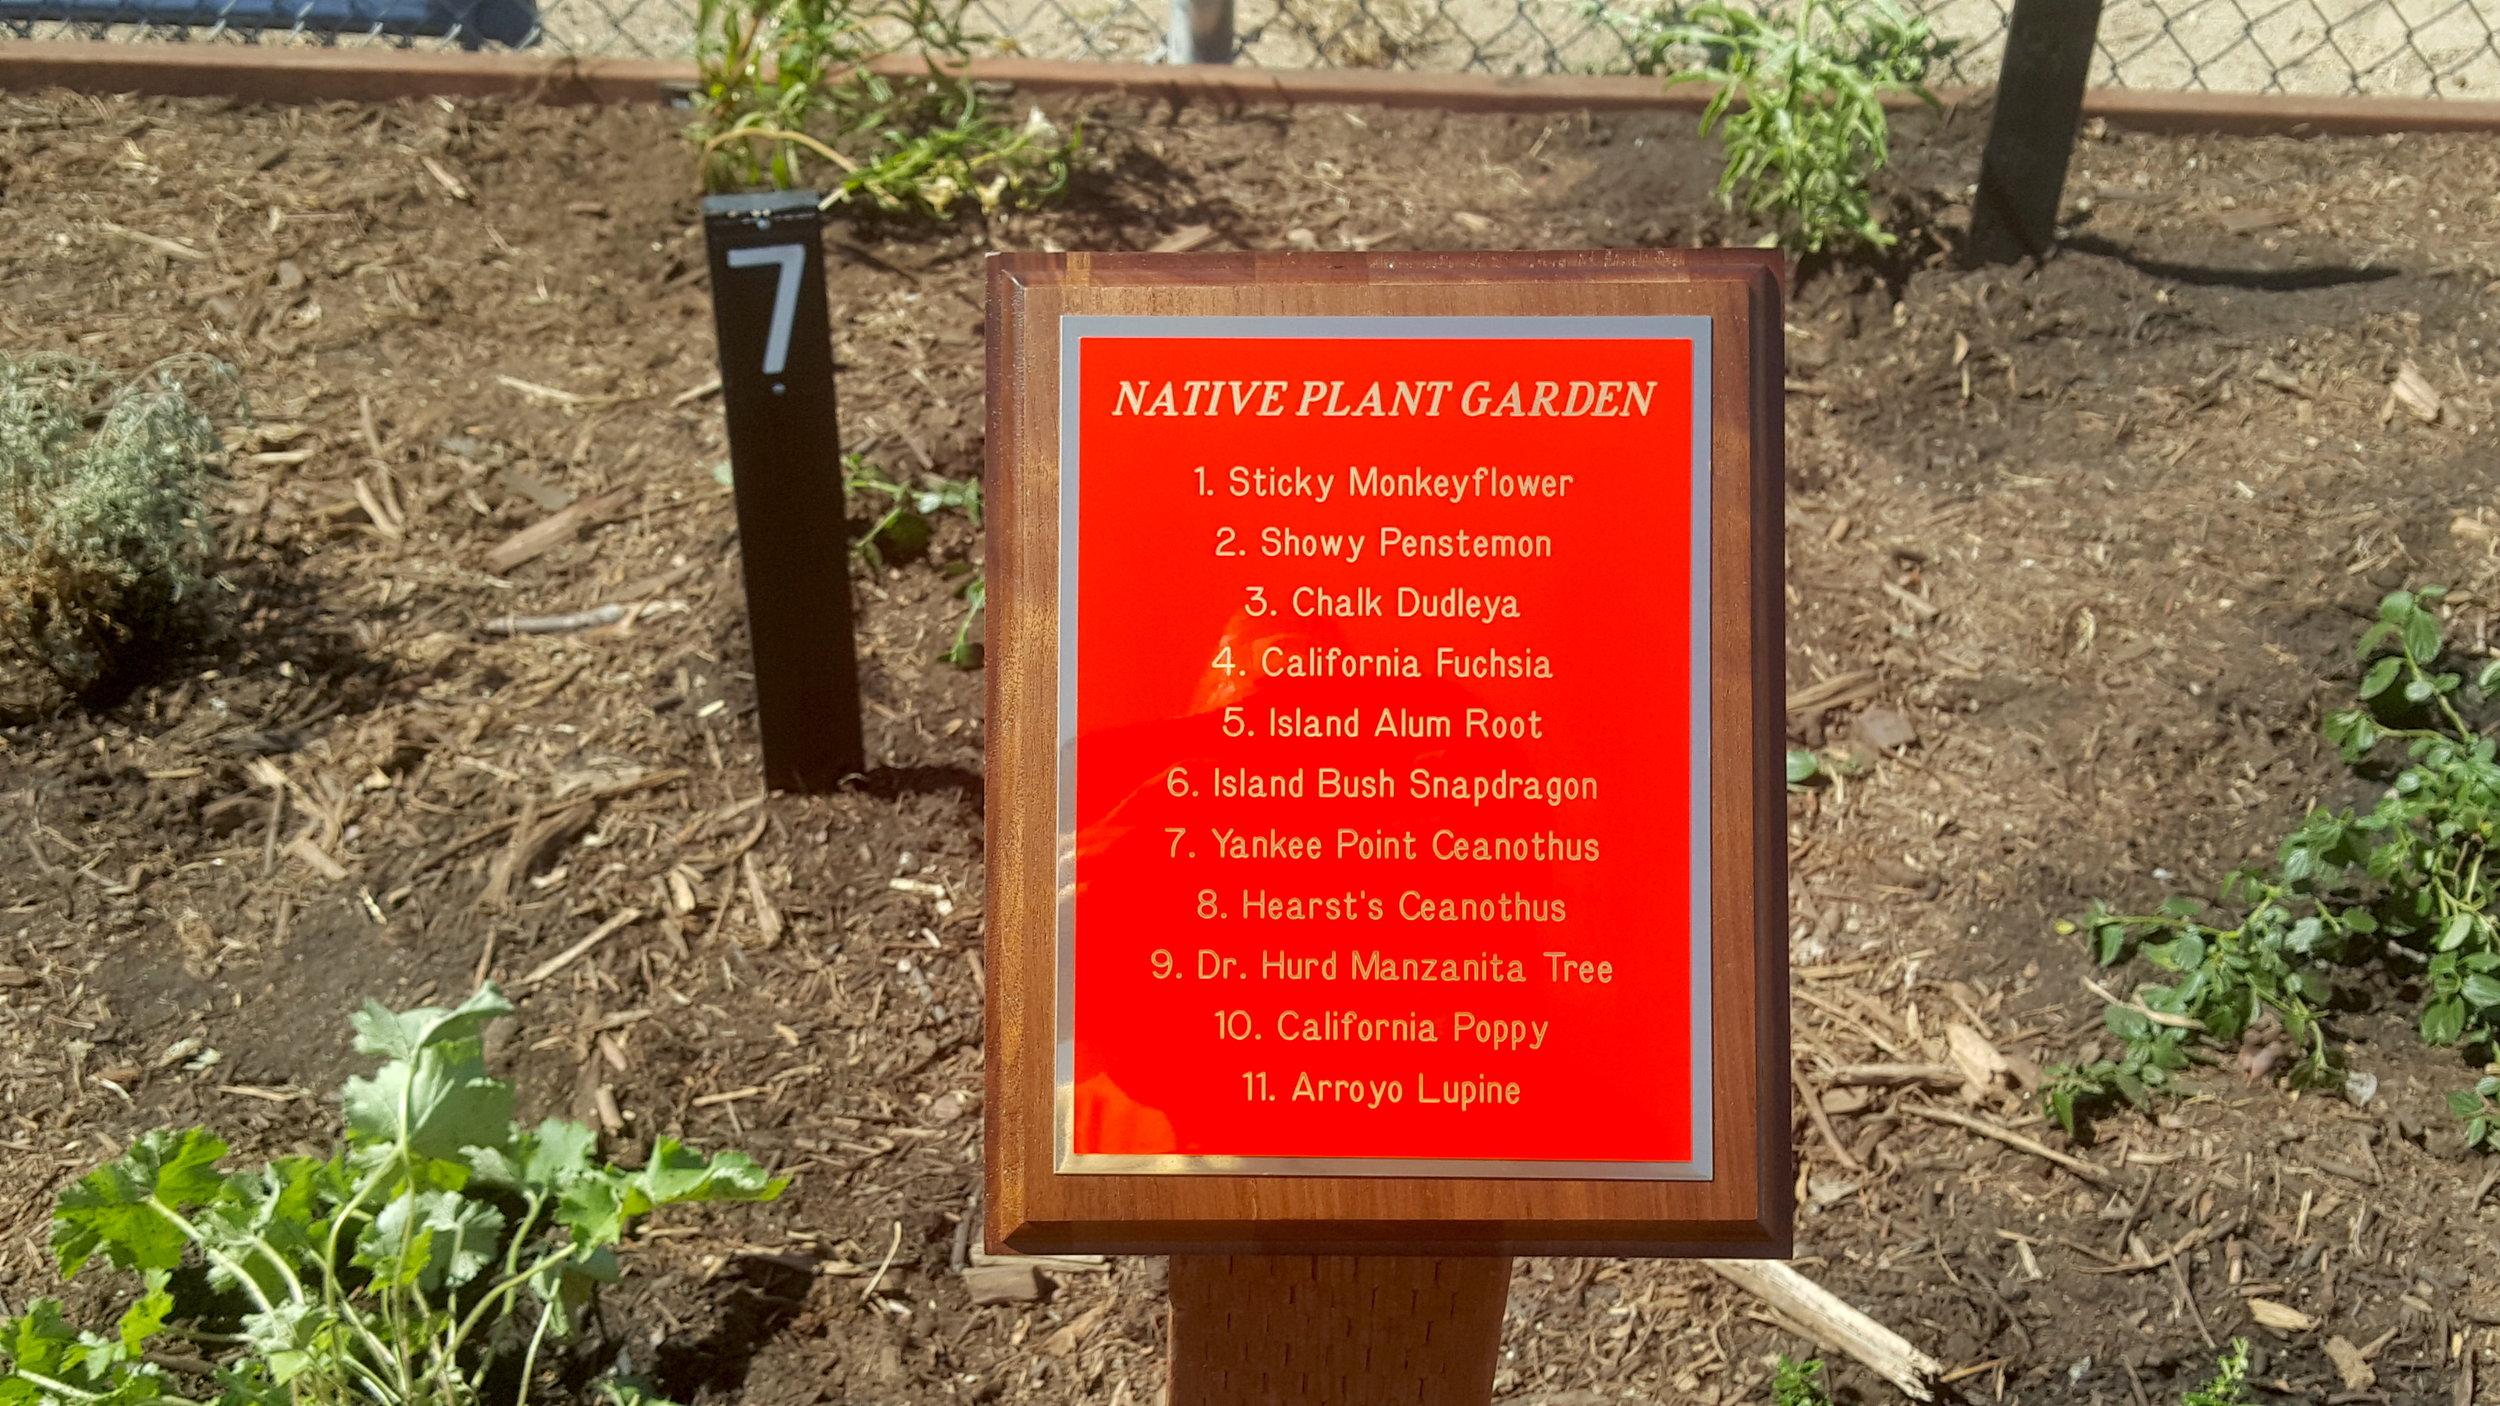 Garden at Cajon Park School in Santee conceptualized by Josh Long